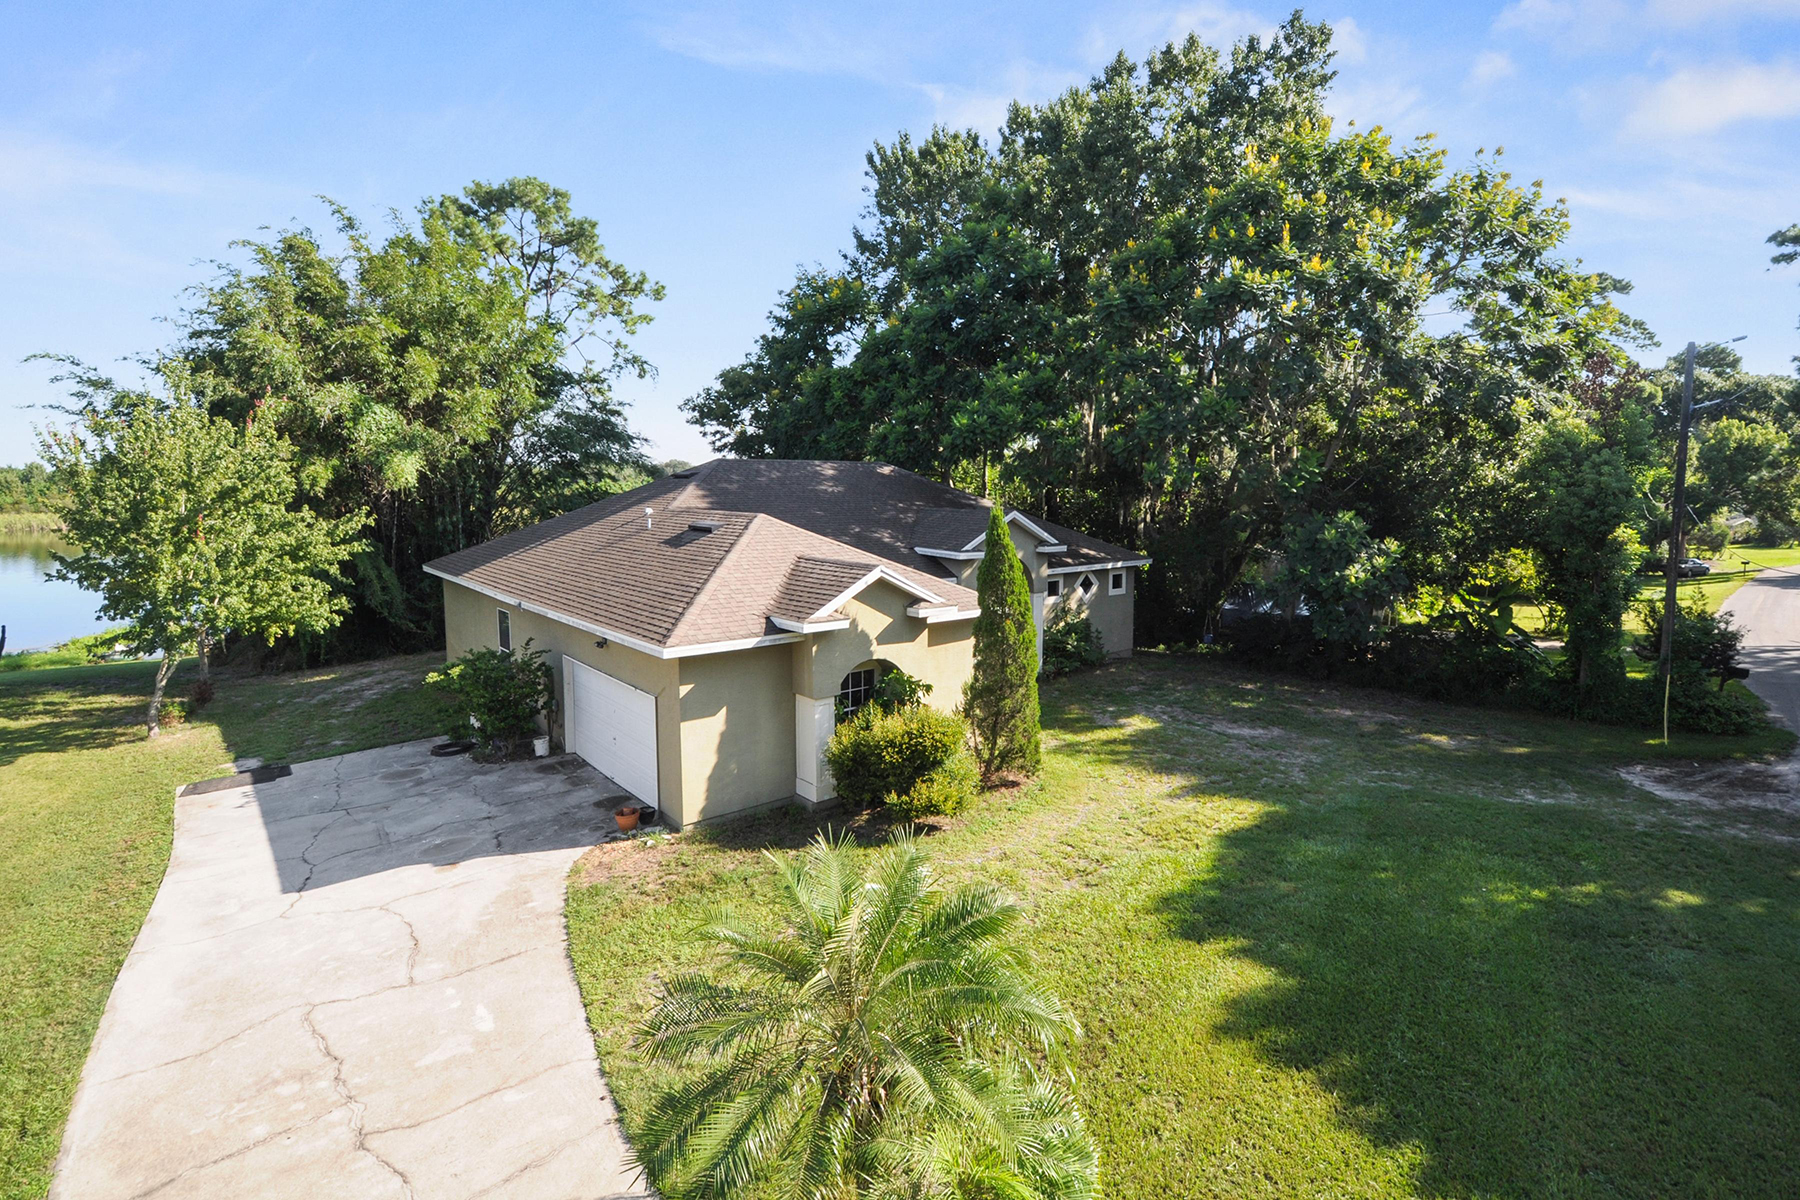 Single Family Home for Sale at GOTHA,FLORIDA 2024 Twin Lake Dr Gotha, Florida, 34734 United States